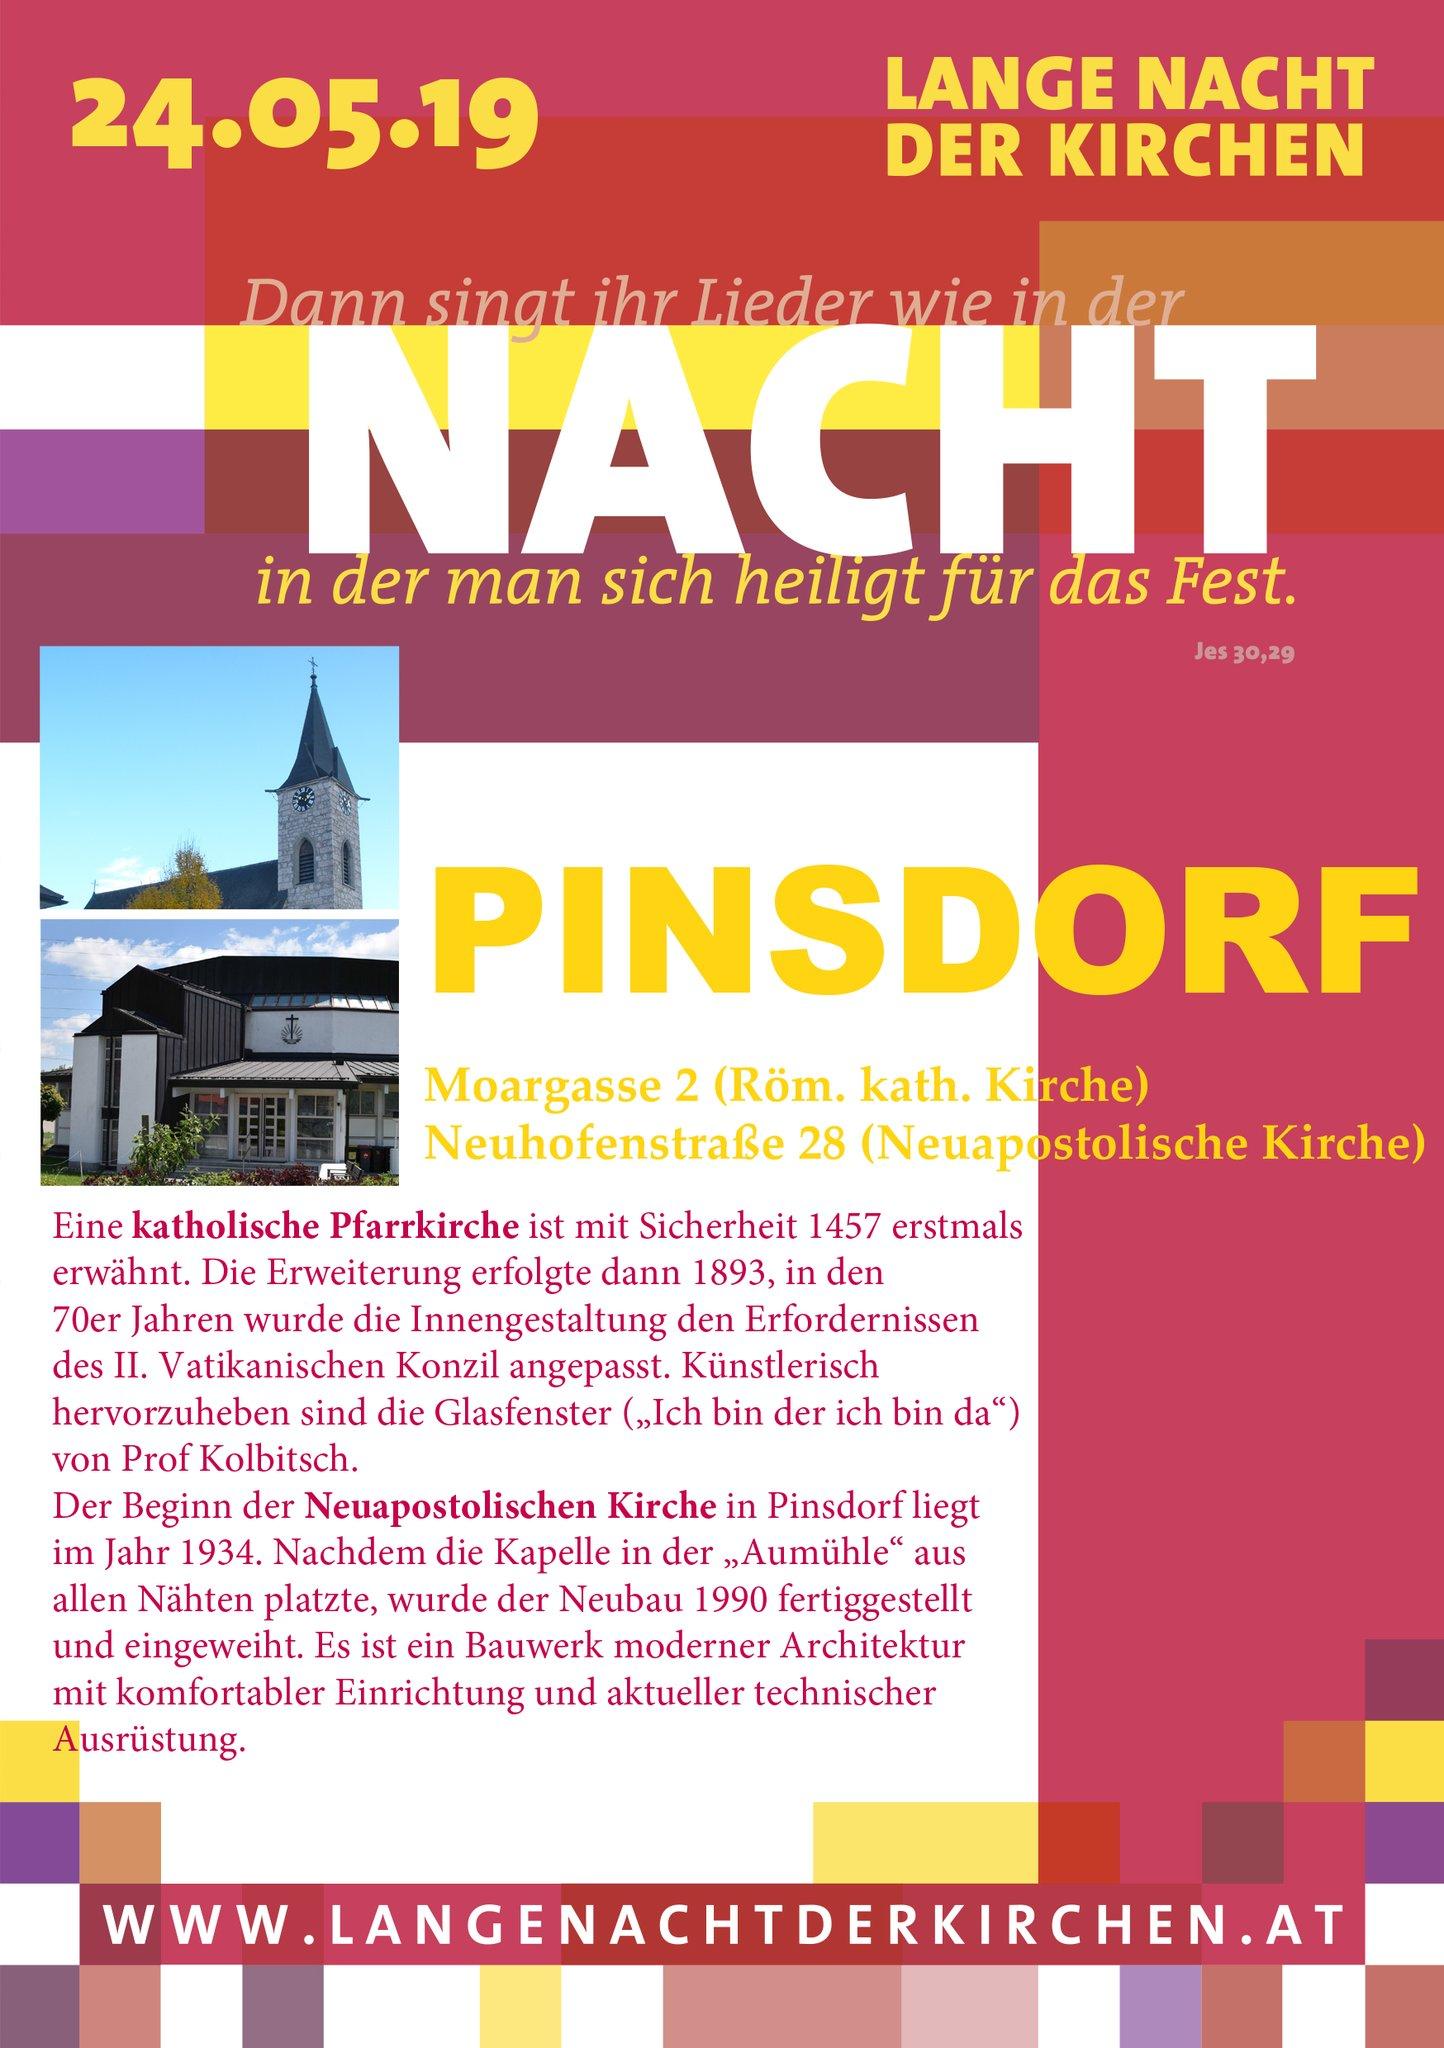 Pinsdorf - Posts | Facebook